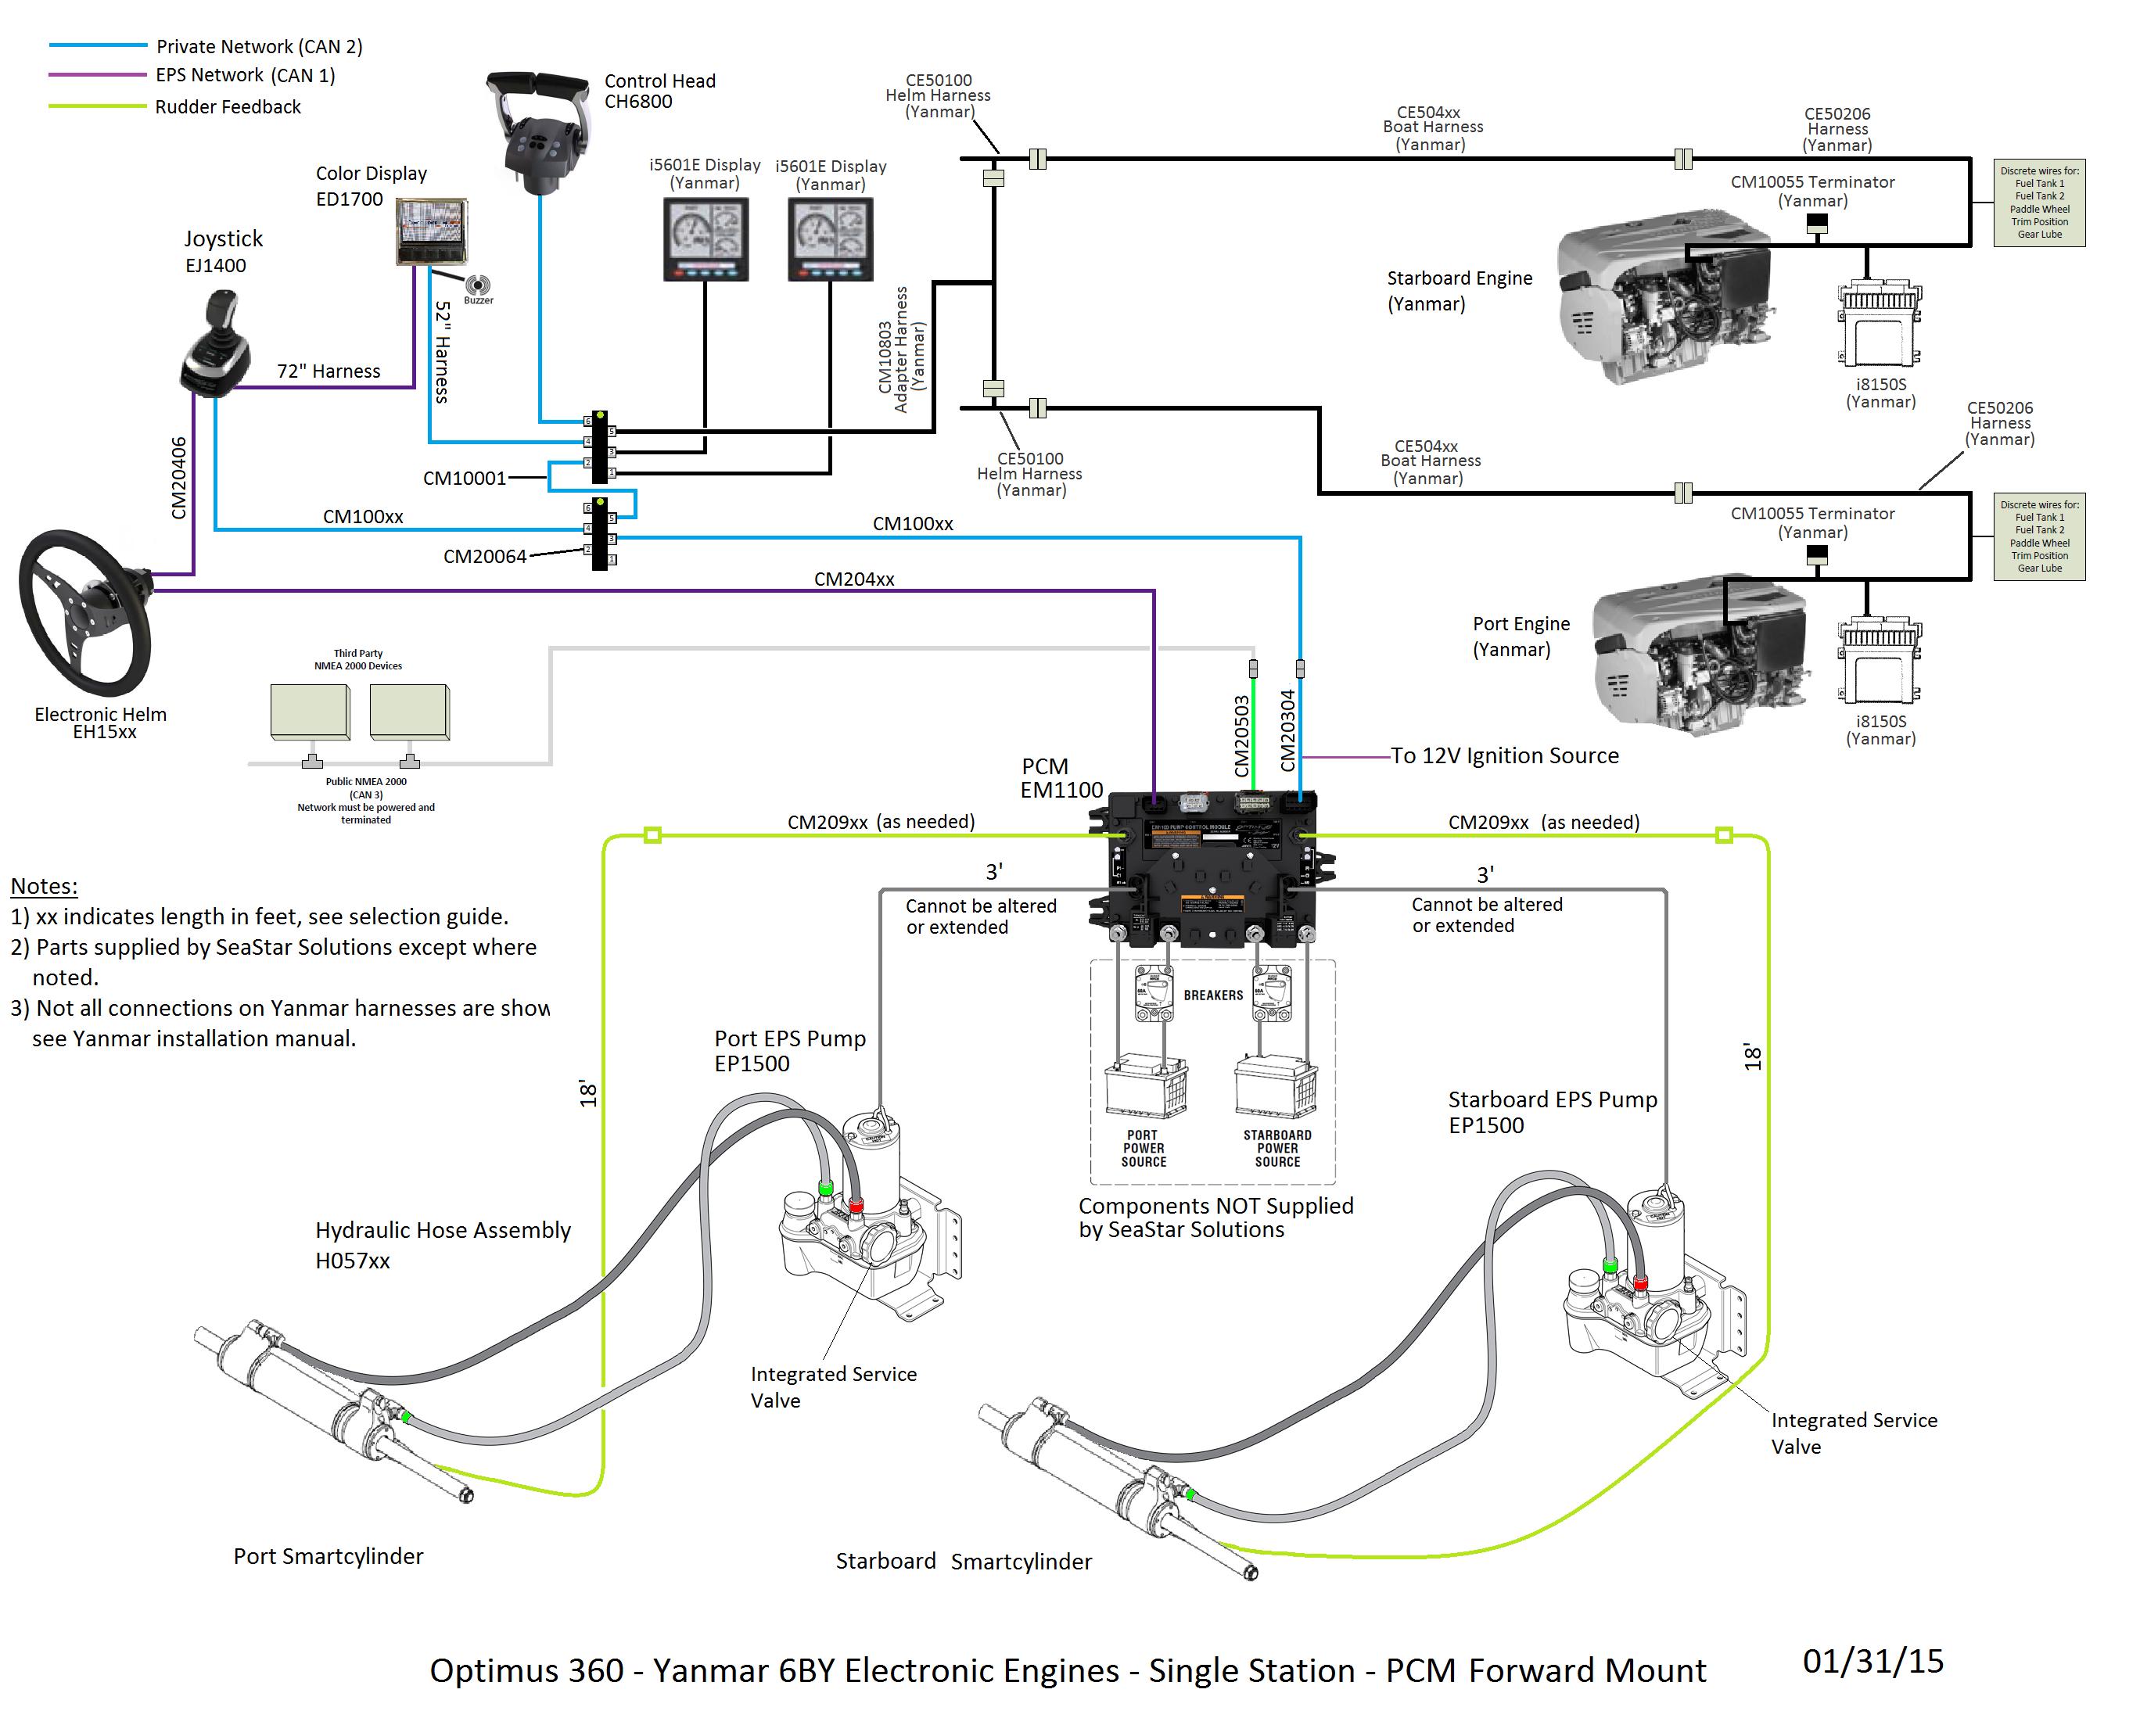 Yanmar yse manual array yanmar marine engine installation manual wiring diagram and schematics rh diagramschematics us fandeluxe Images